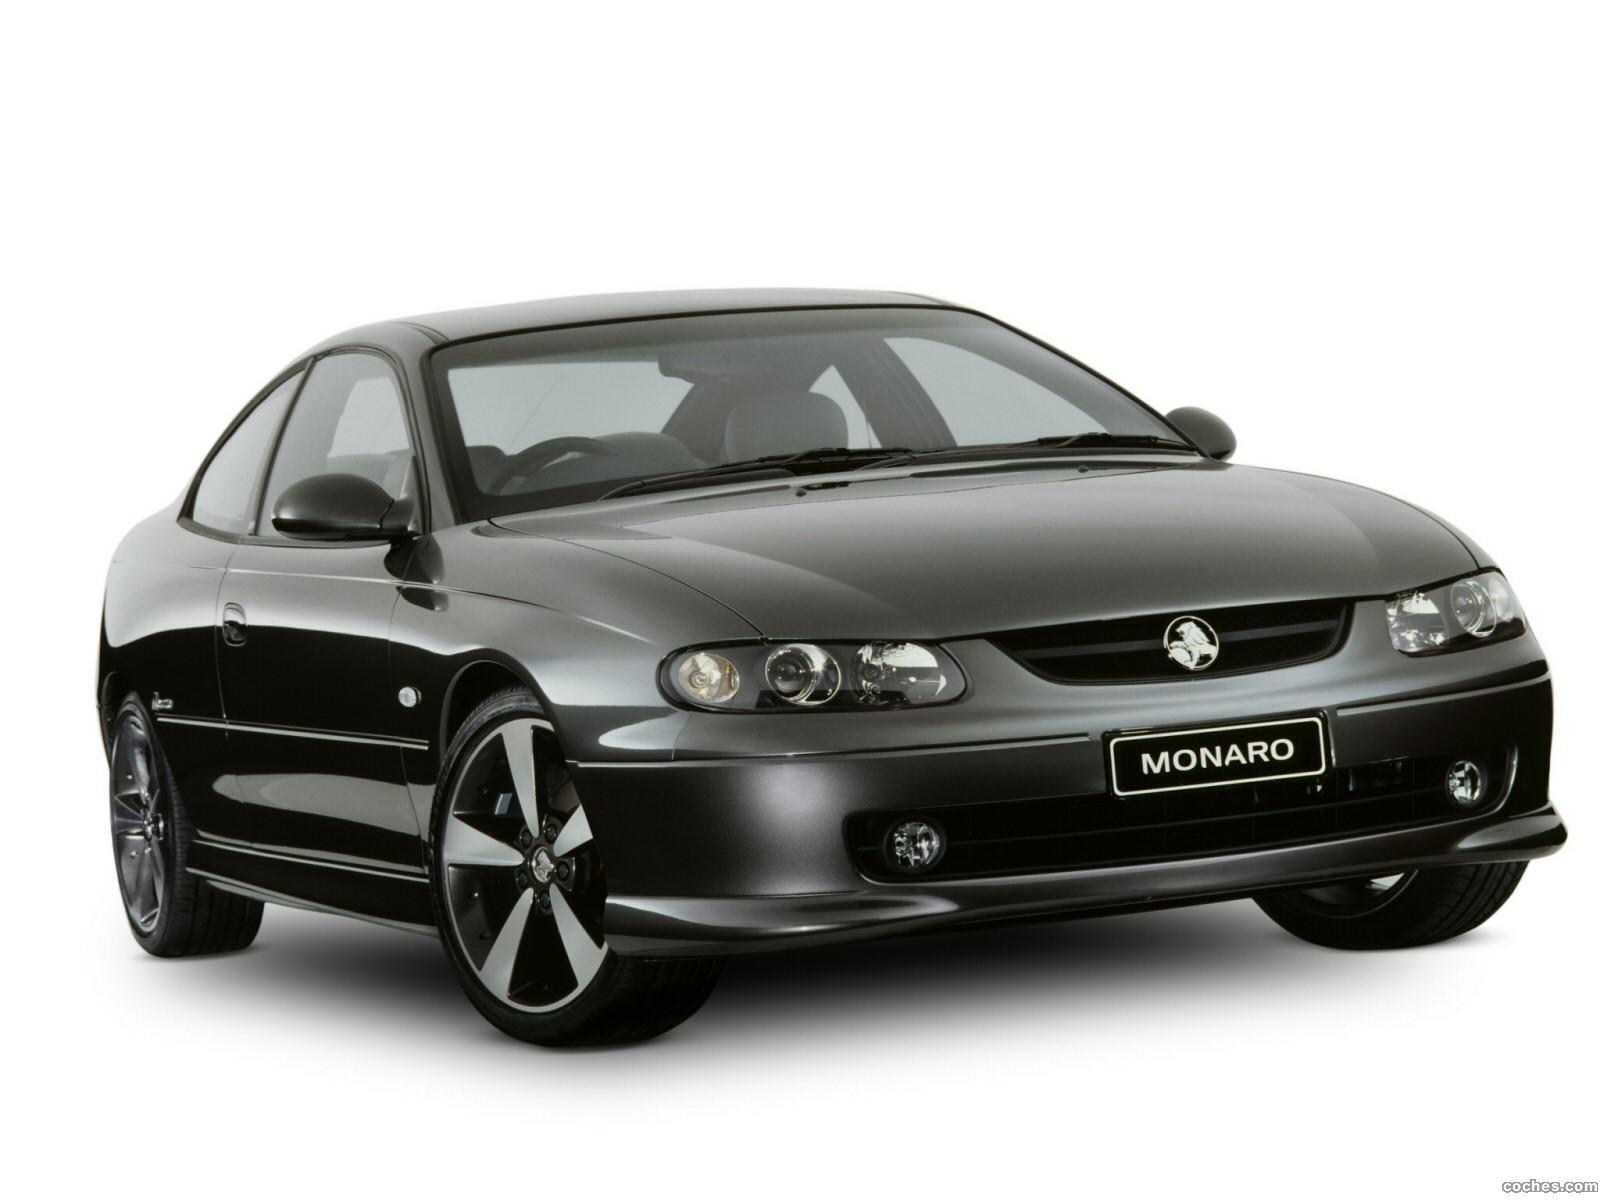 Foto 0 de Holden Monaro CV8R 2002